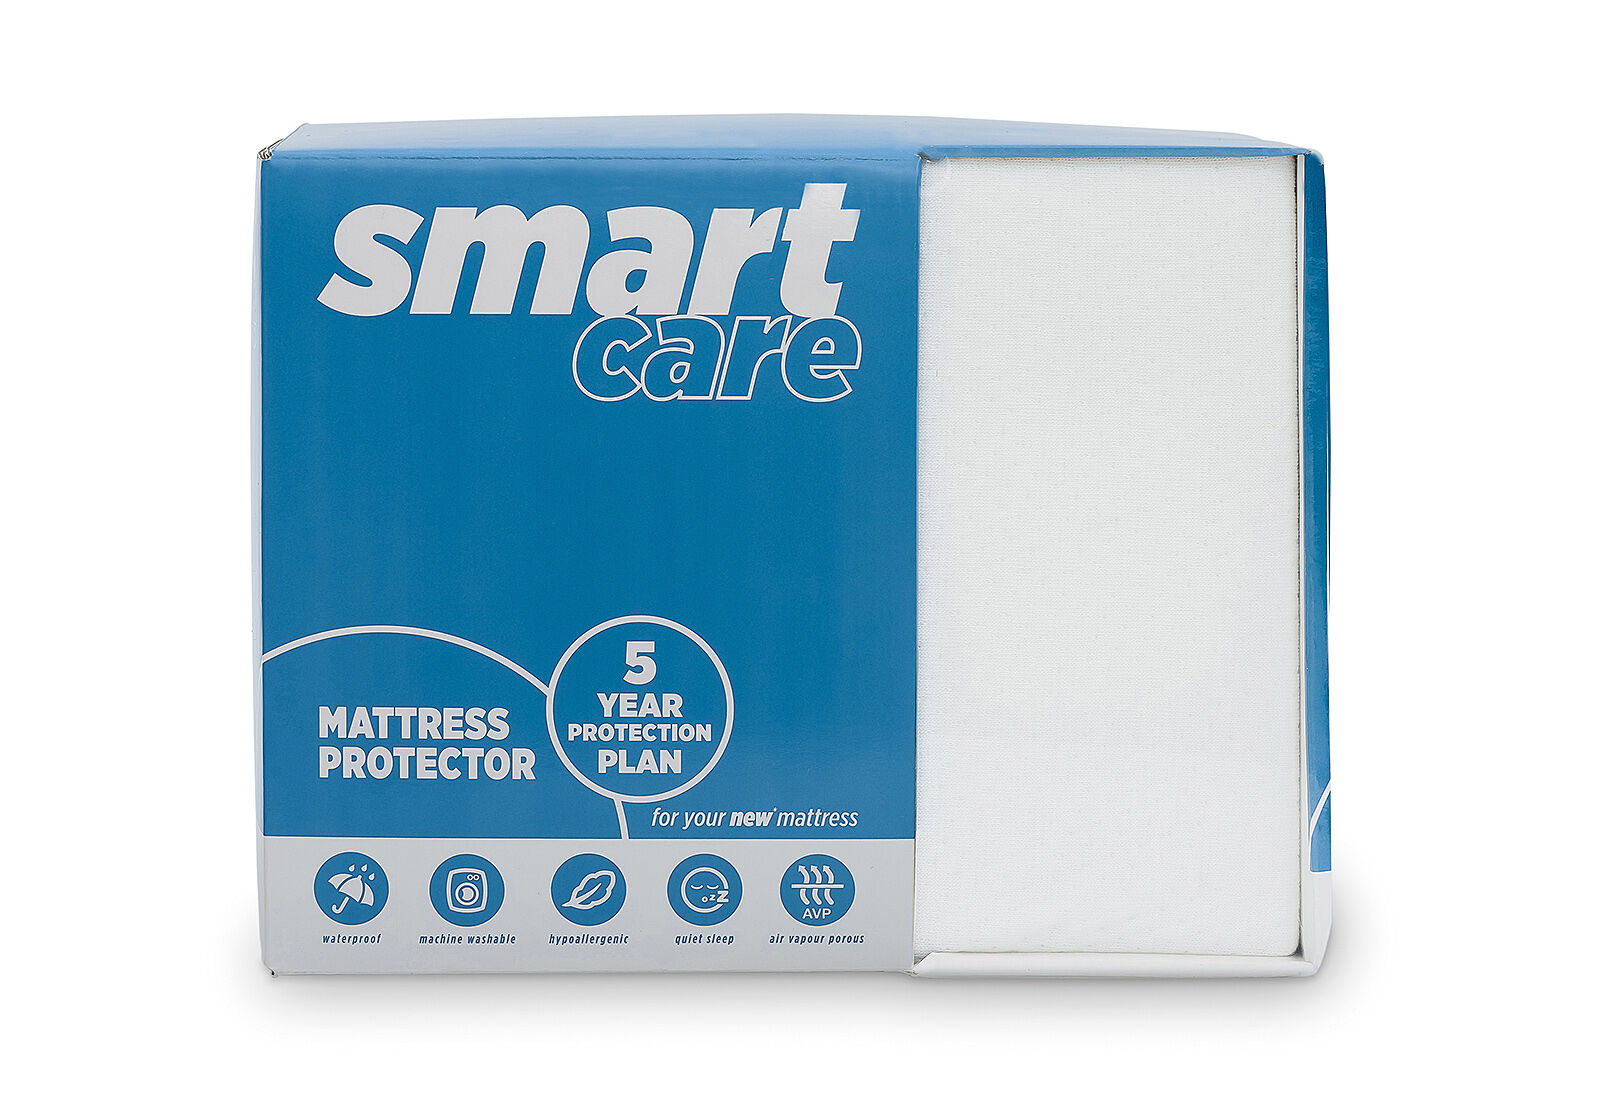 SMART CARE MATTRESS PROTECTOR